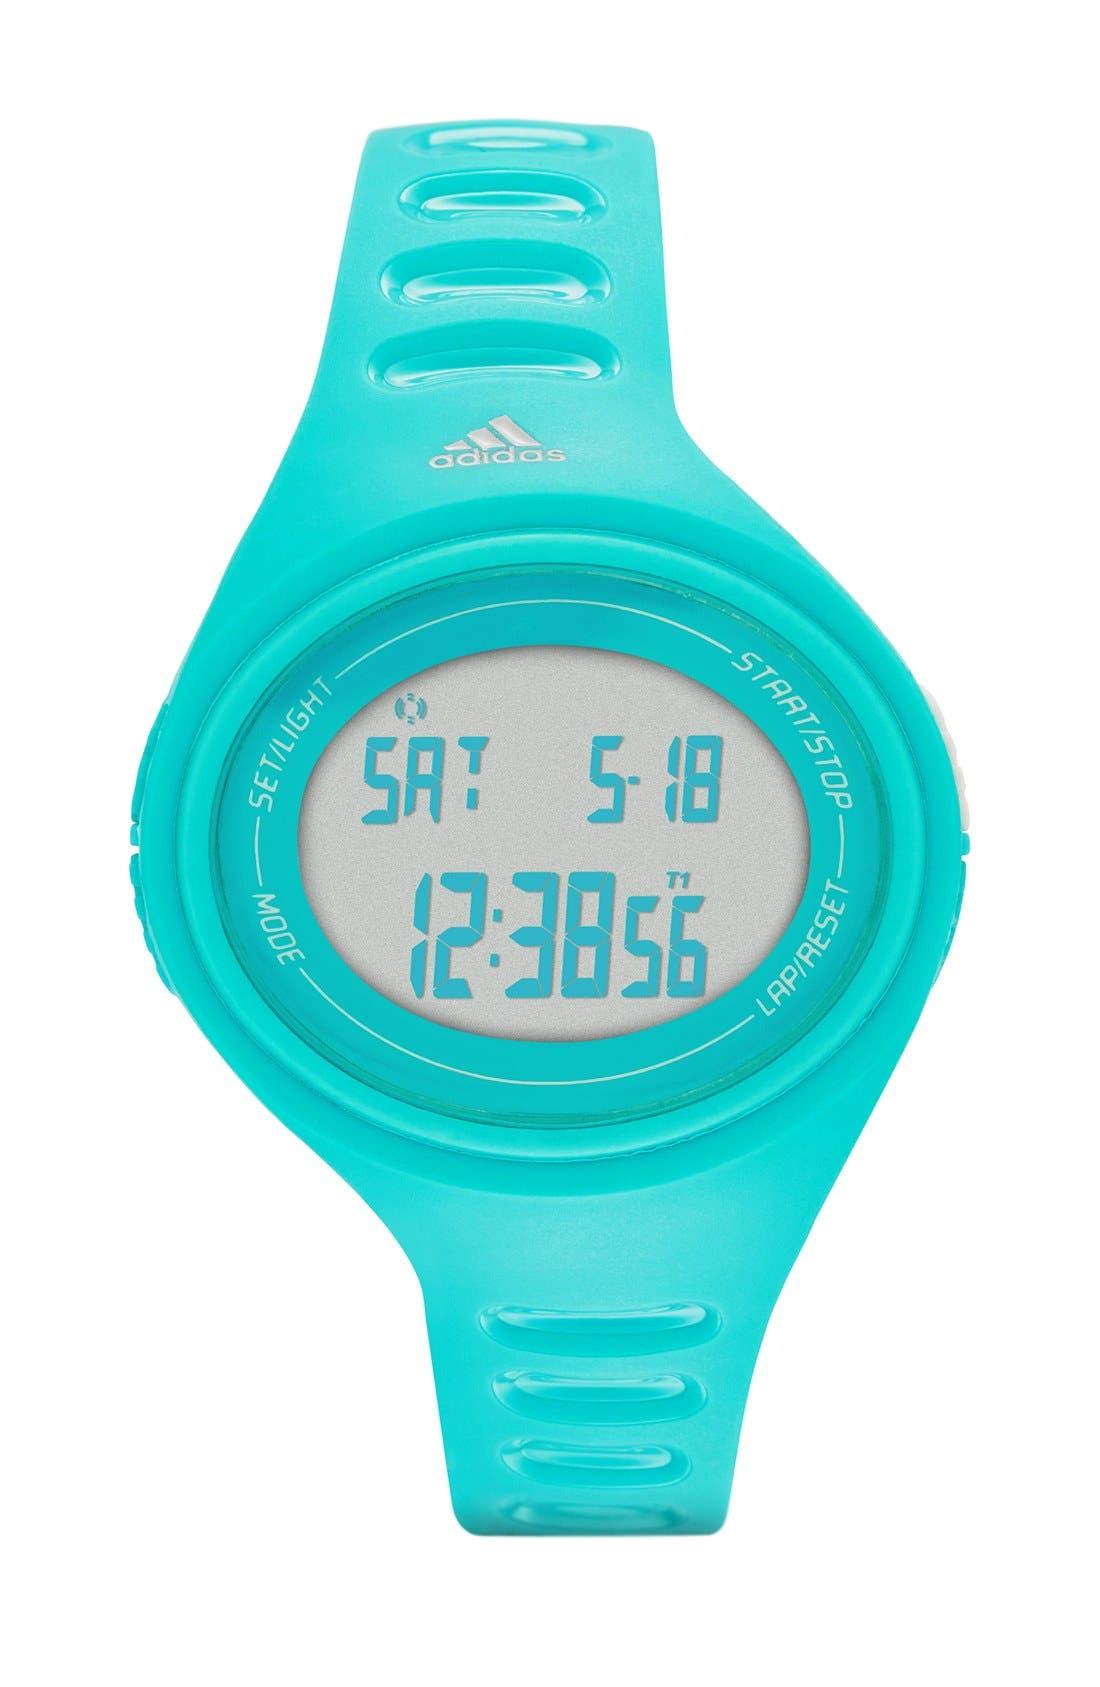 Main Image - adidas Performance 'Adizero' Digital Watch, 43mm x 38mm